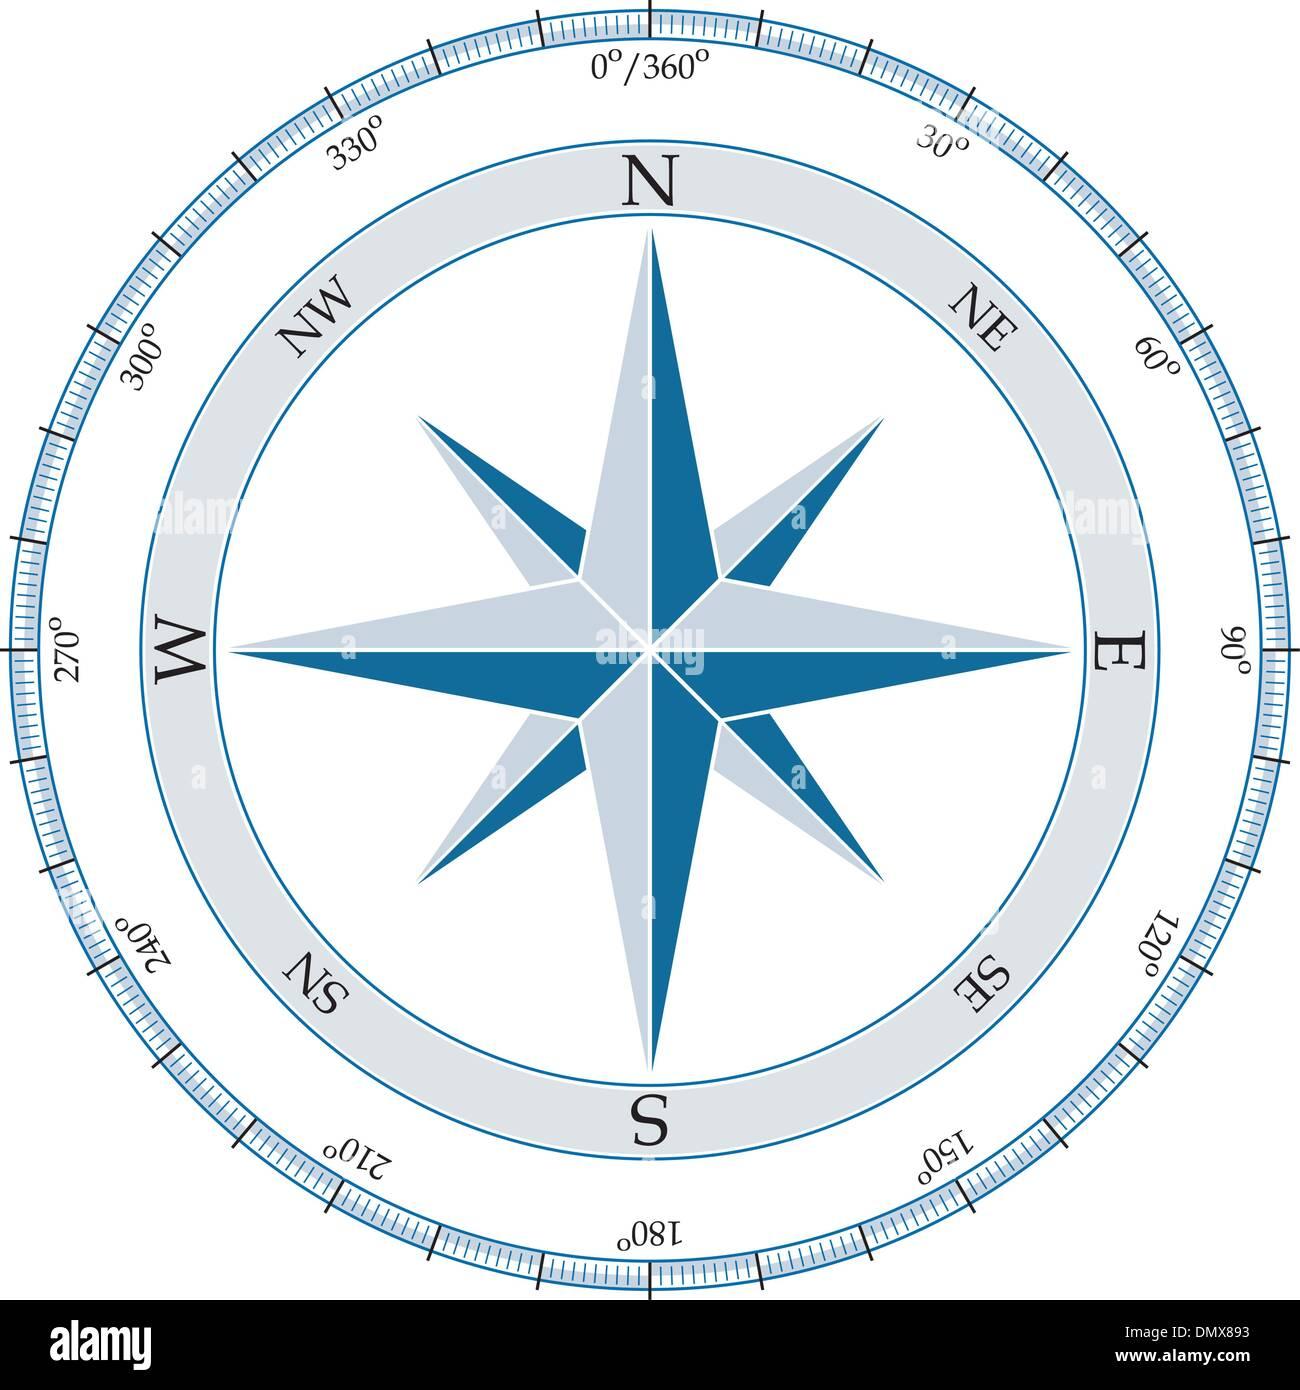 Compass vector illustration stock vector art illustration compass vector illustration pooptronica